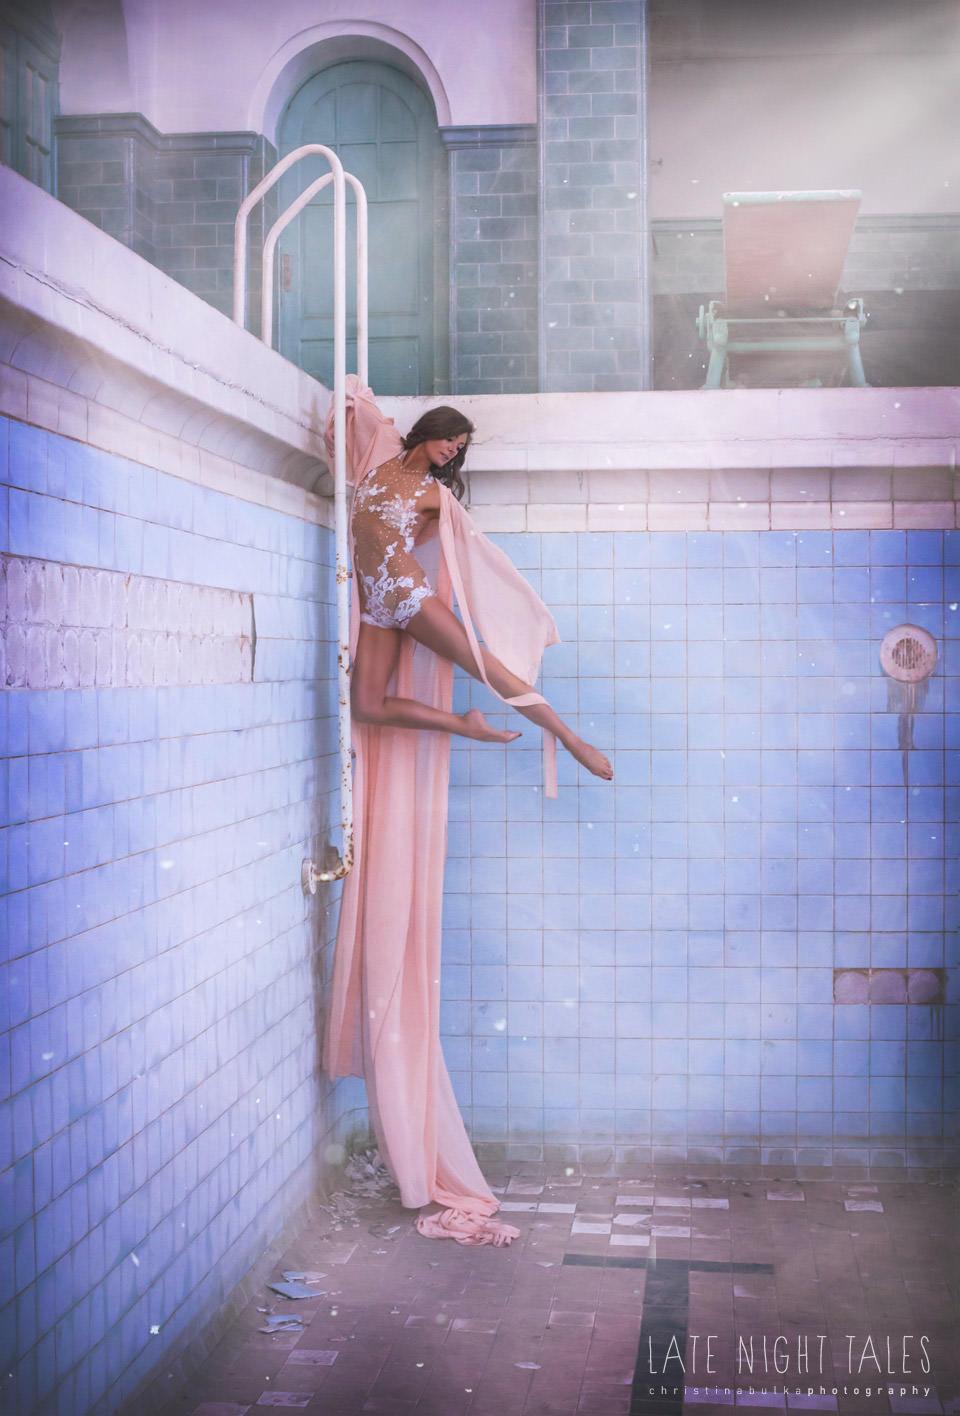 AKROBATIK Shooting - Keeva Treanor (Air Candy) Fotoshooting - LATE NIGHT TALES Christina Bulka Fotograf Fotografie